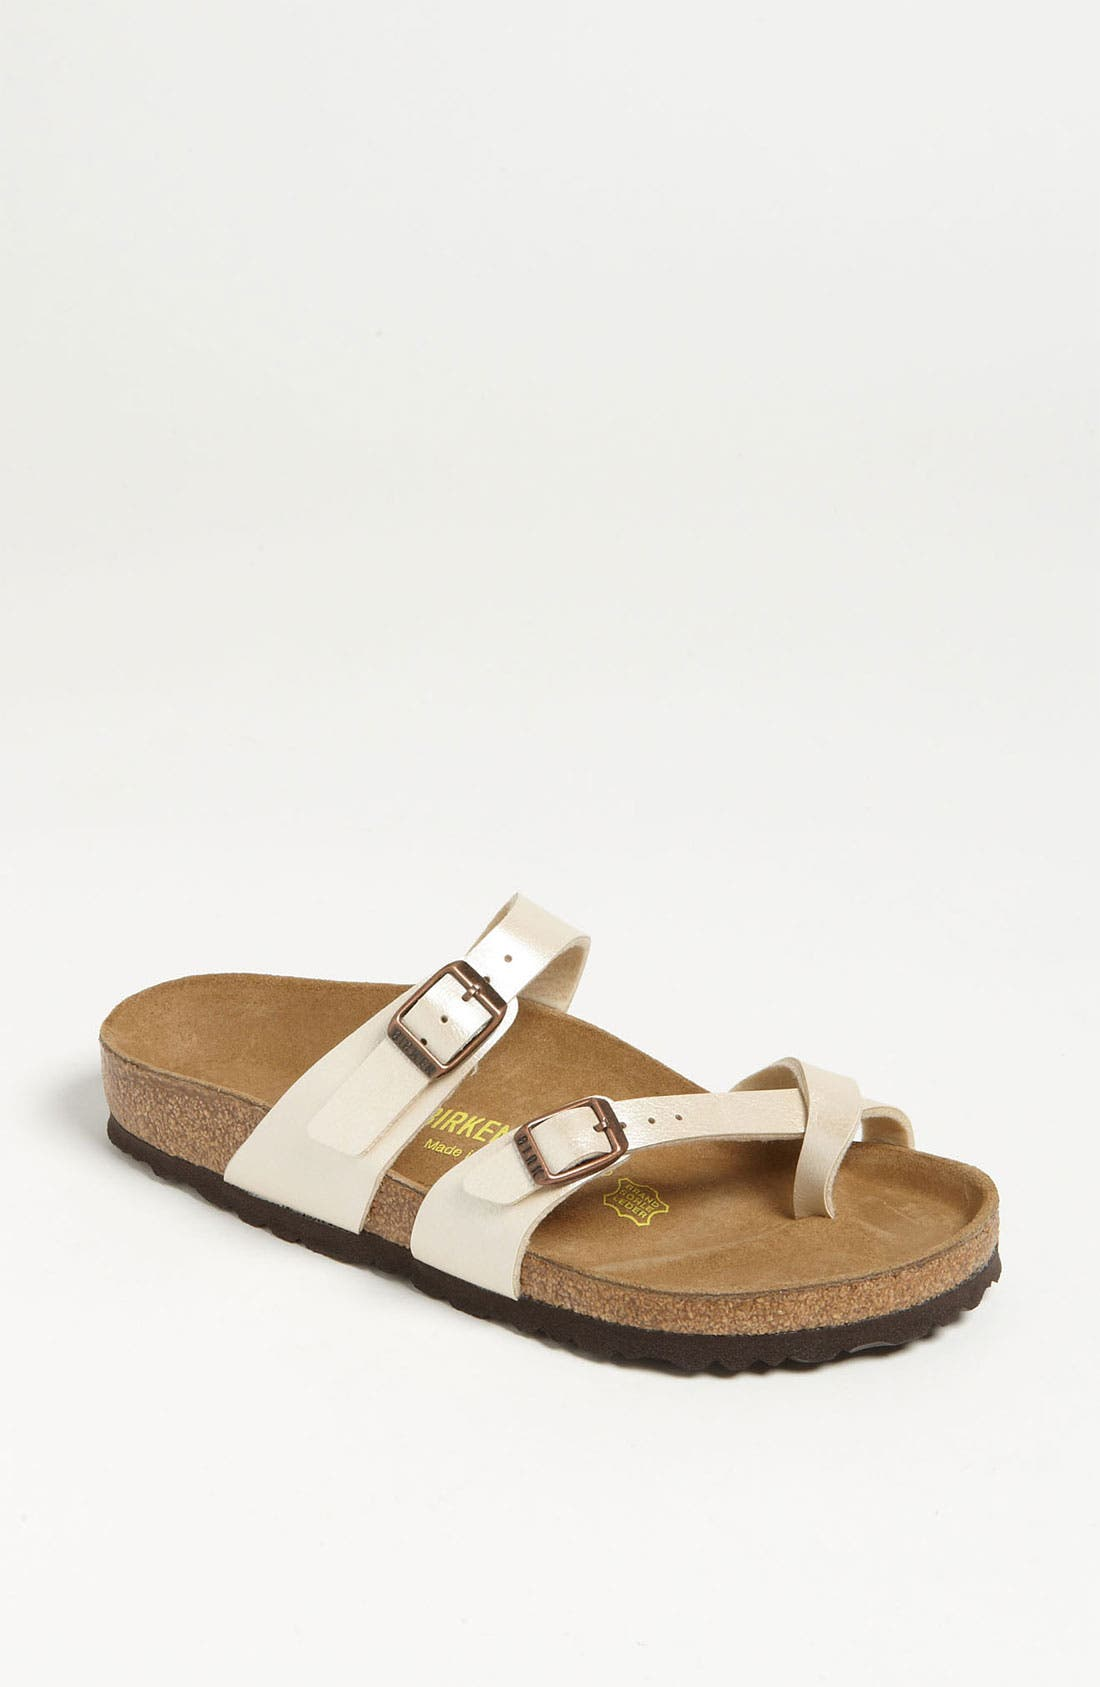 Alternate Image 1 Selected - Birkenstock 'Mayari' Birko-Flor™ Sandal (Women)